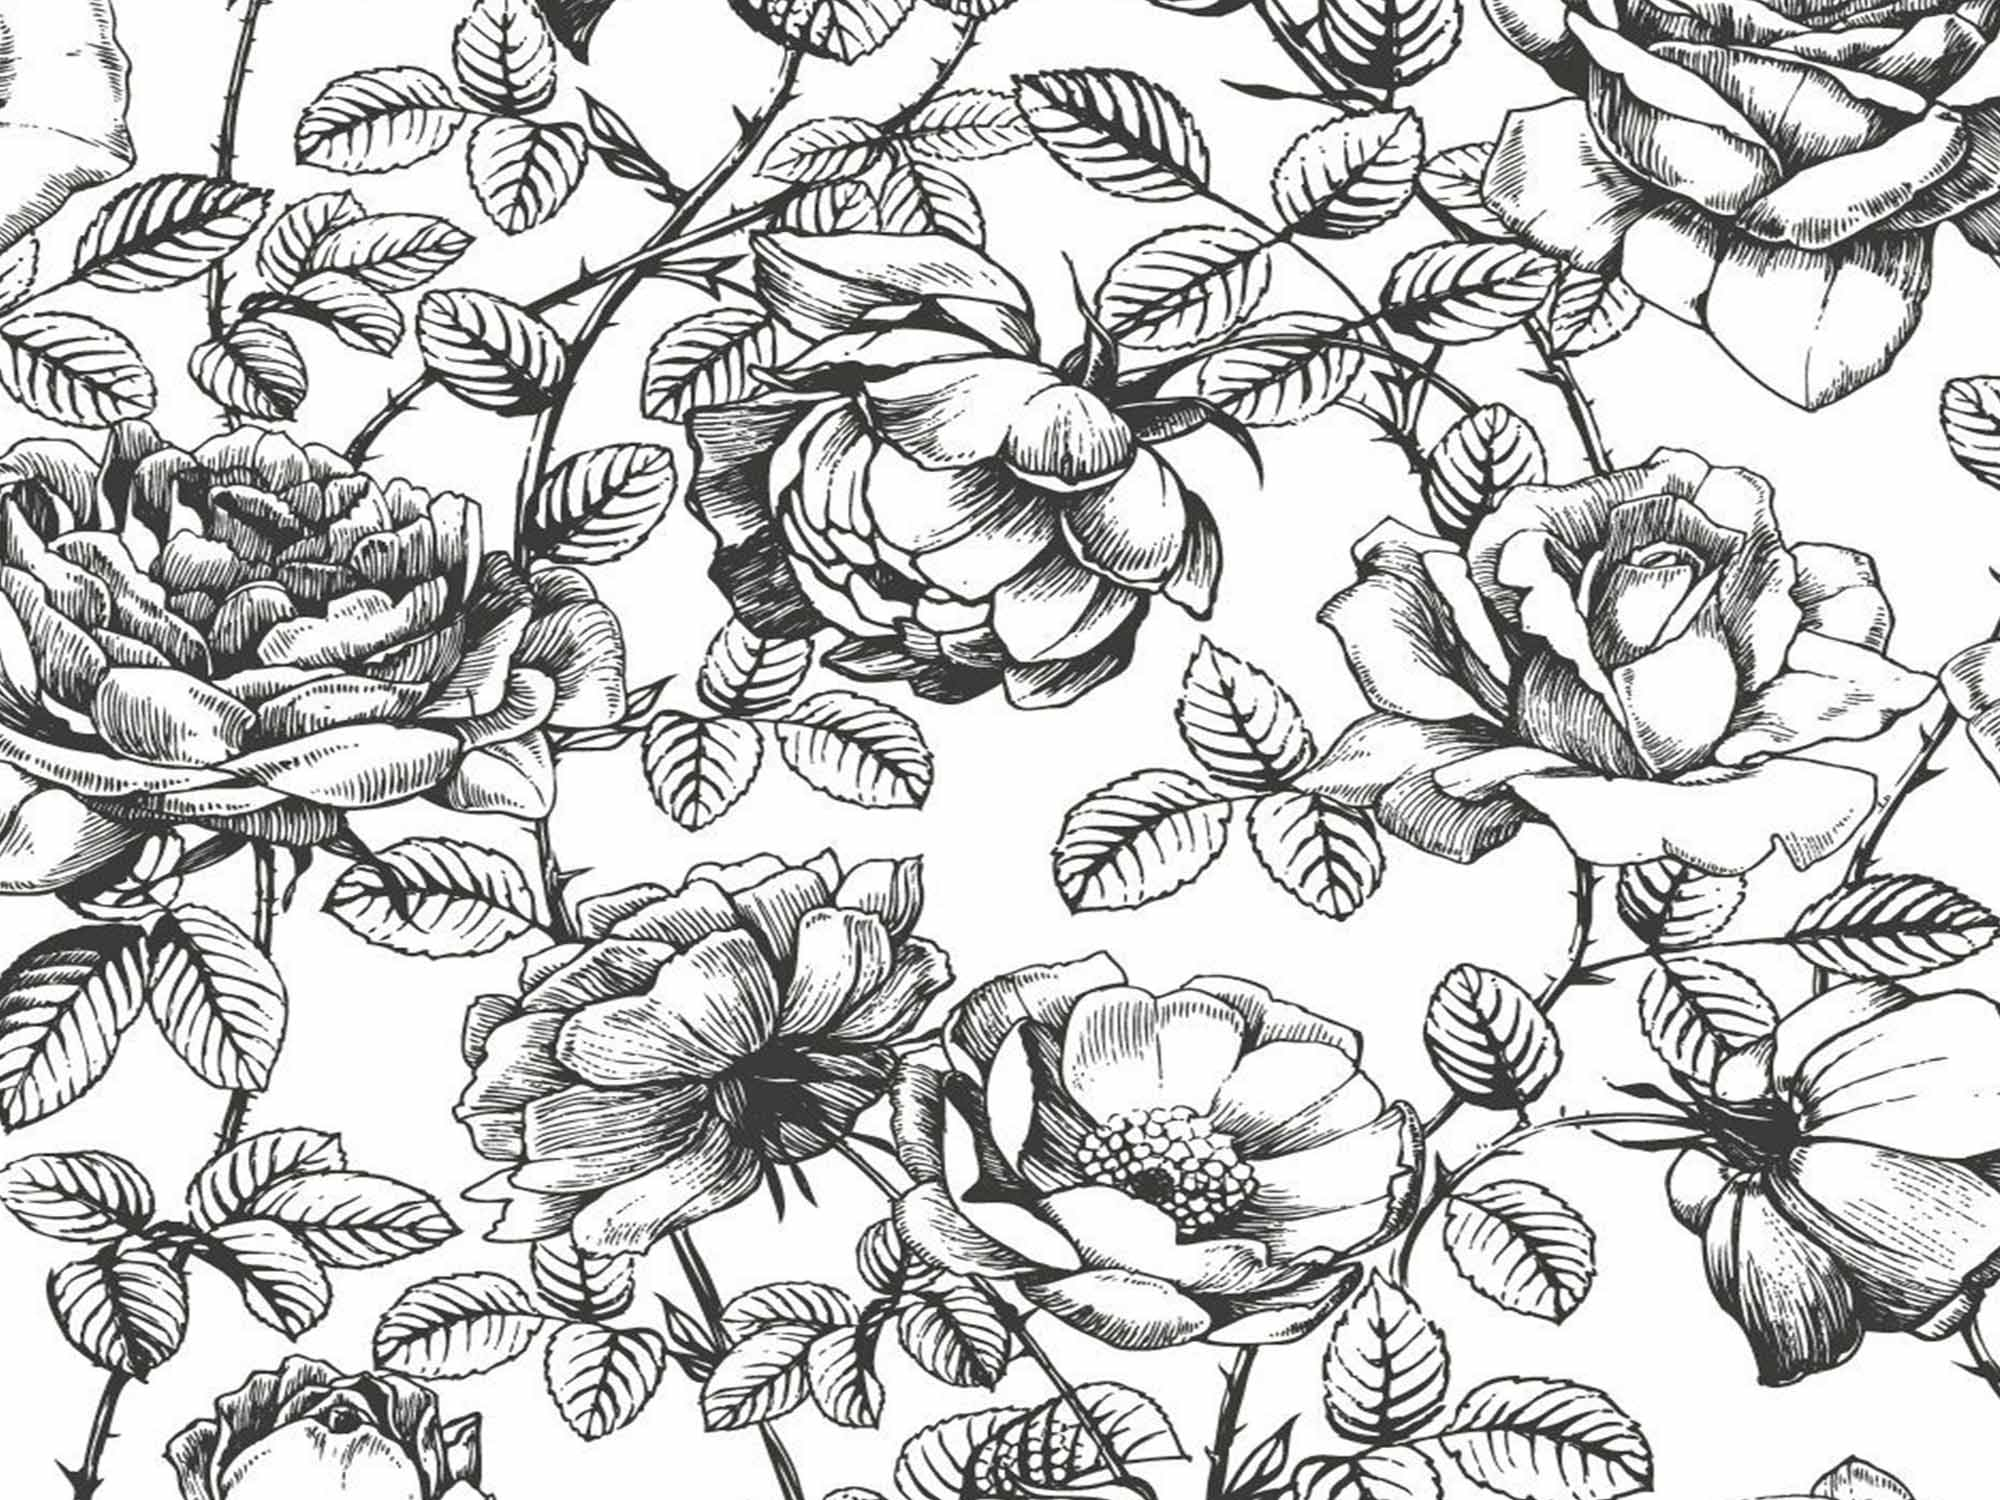 Papel de Parede Floral 0112 - Adesivos de Parede  - Paredes Decoradas